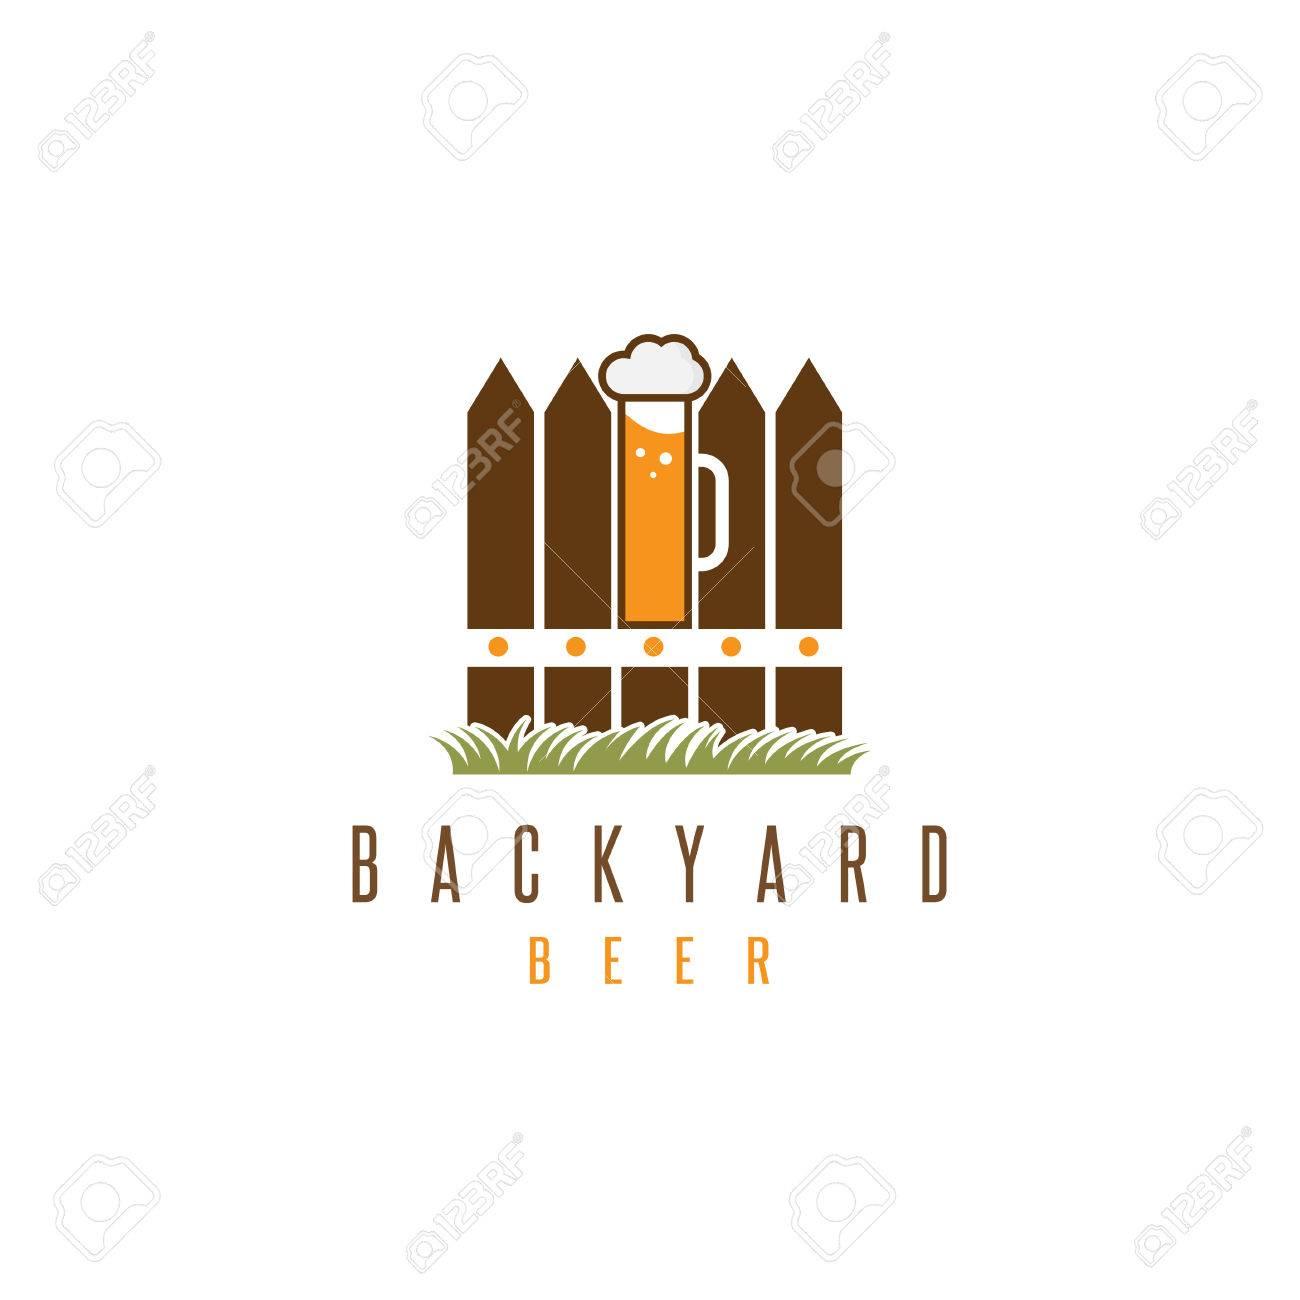 backyard beer vector design template with fence and mug royalty